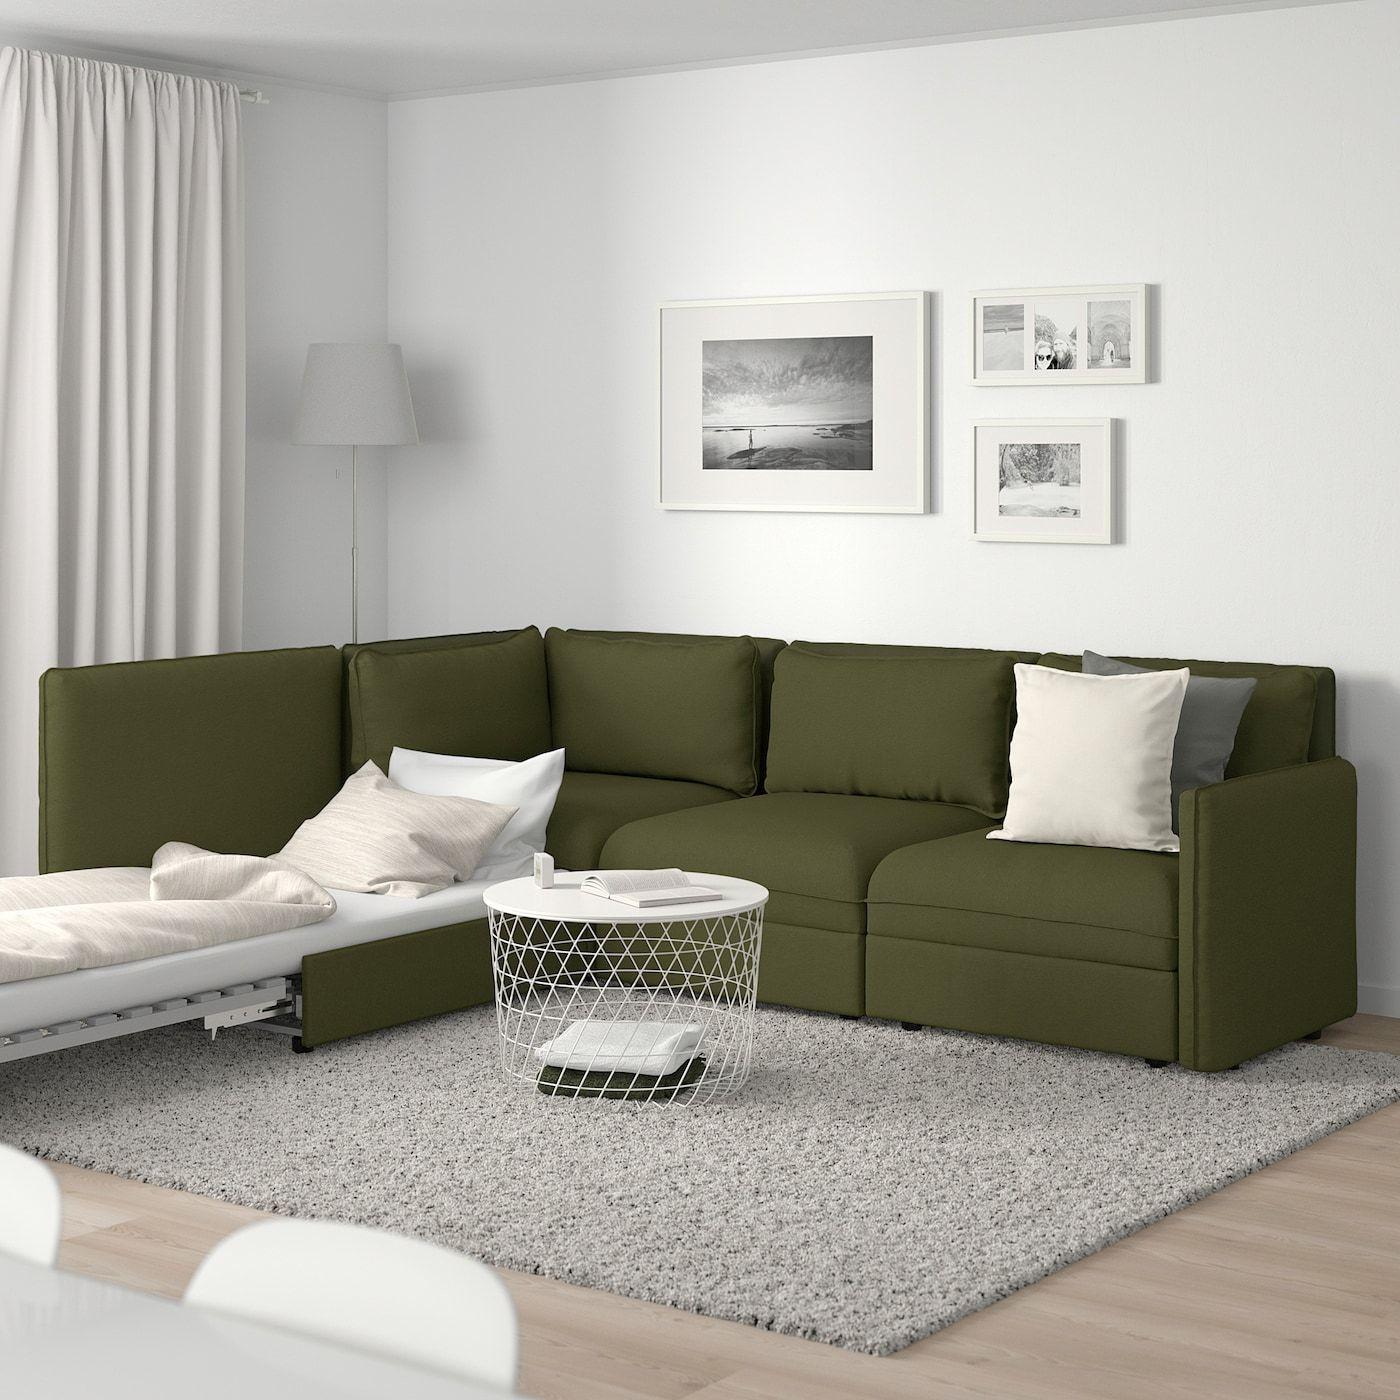 Ikea Vallentuna Mod Sectional 3 Seat